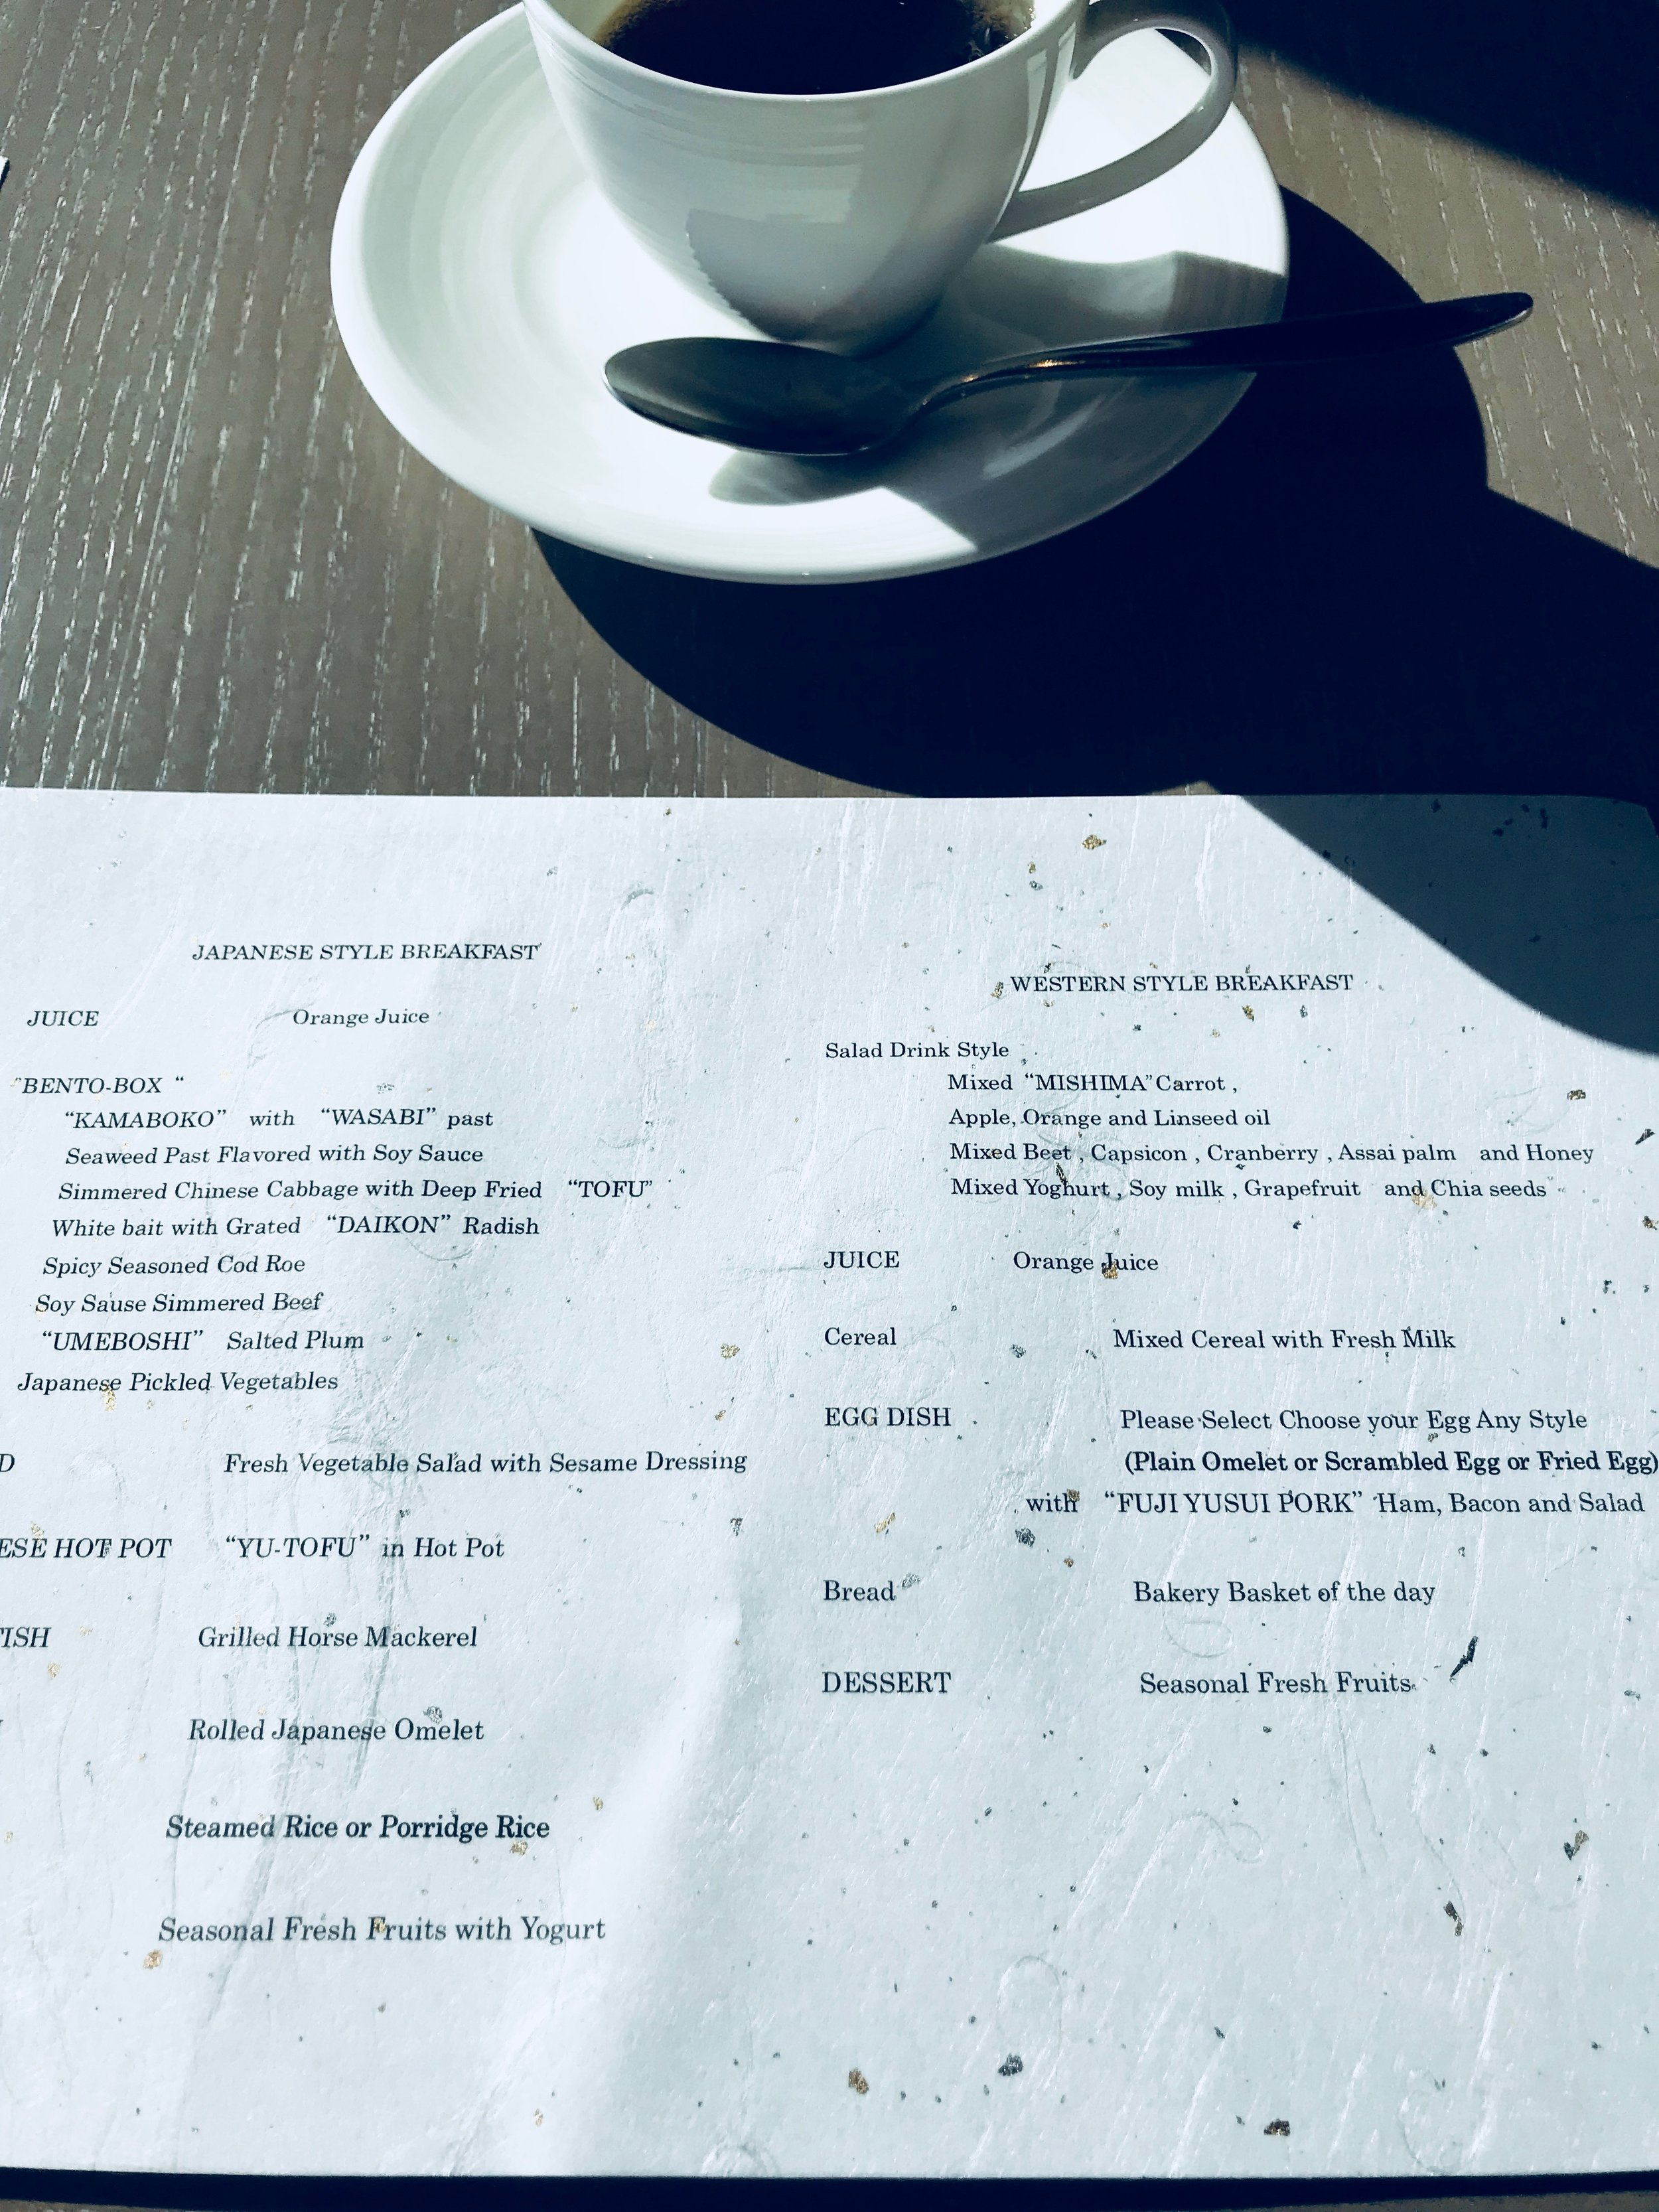 Breakfast menu at Tenyu Restaurant